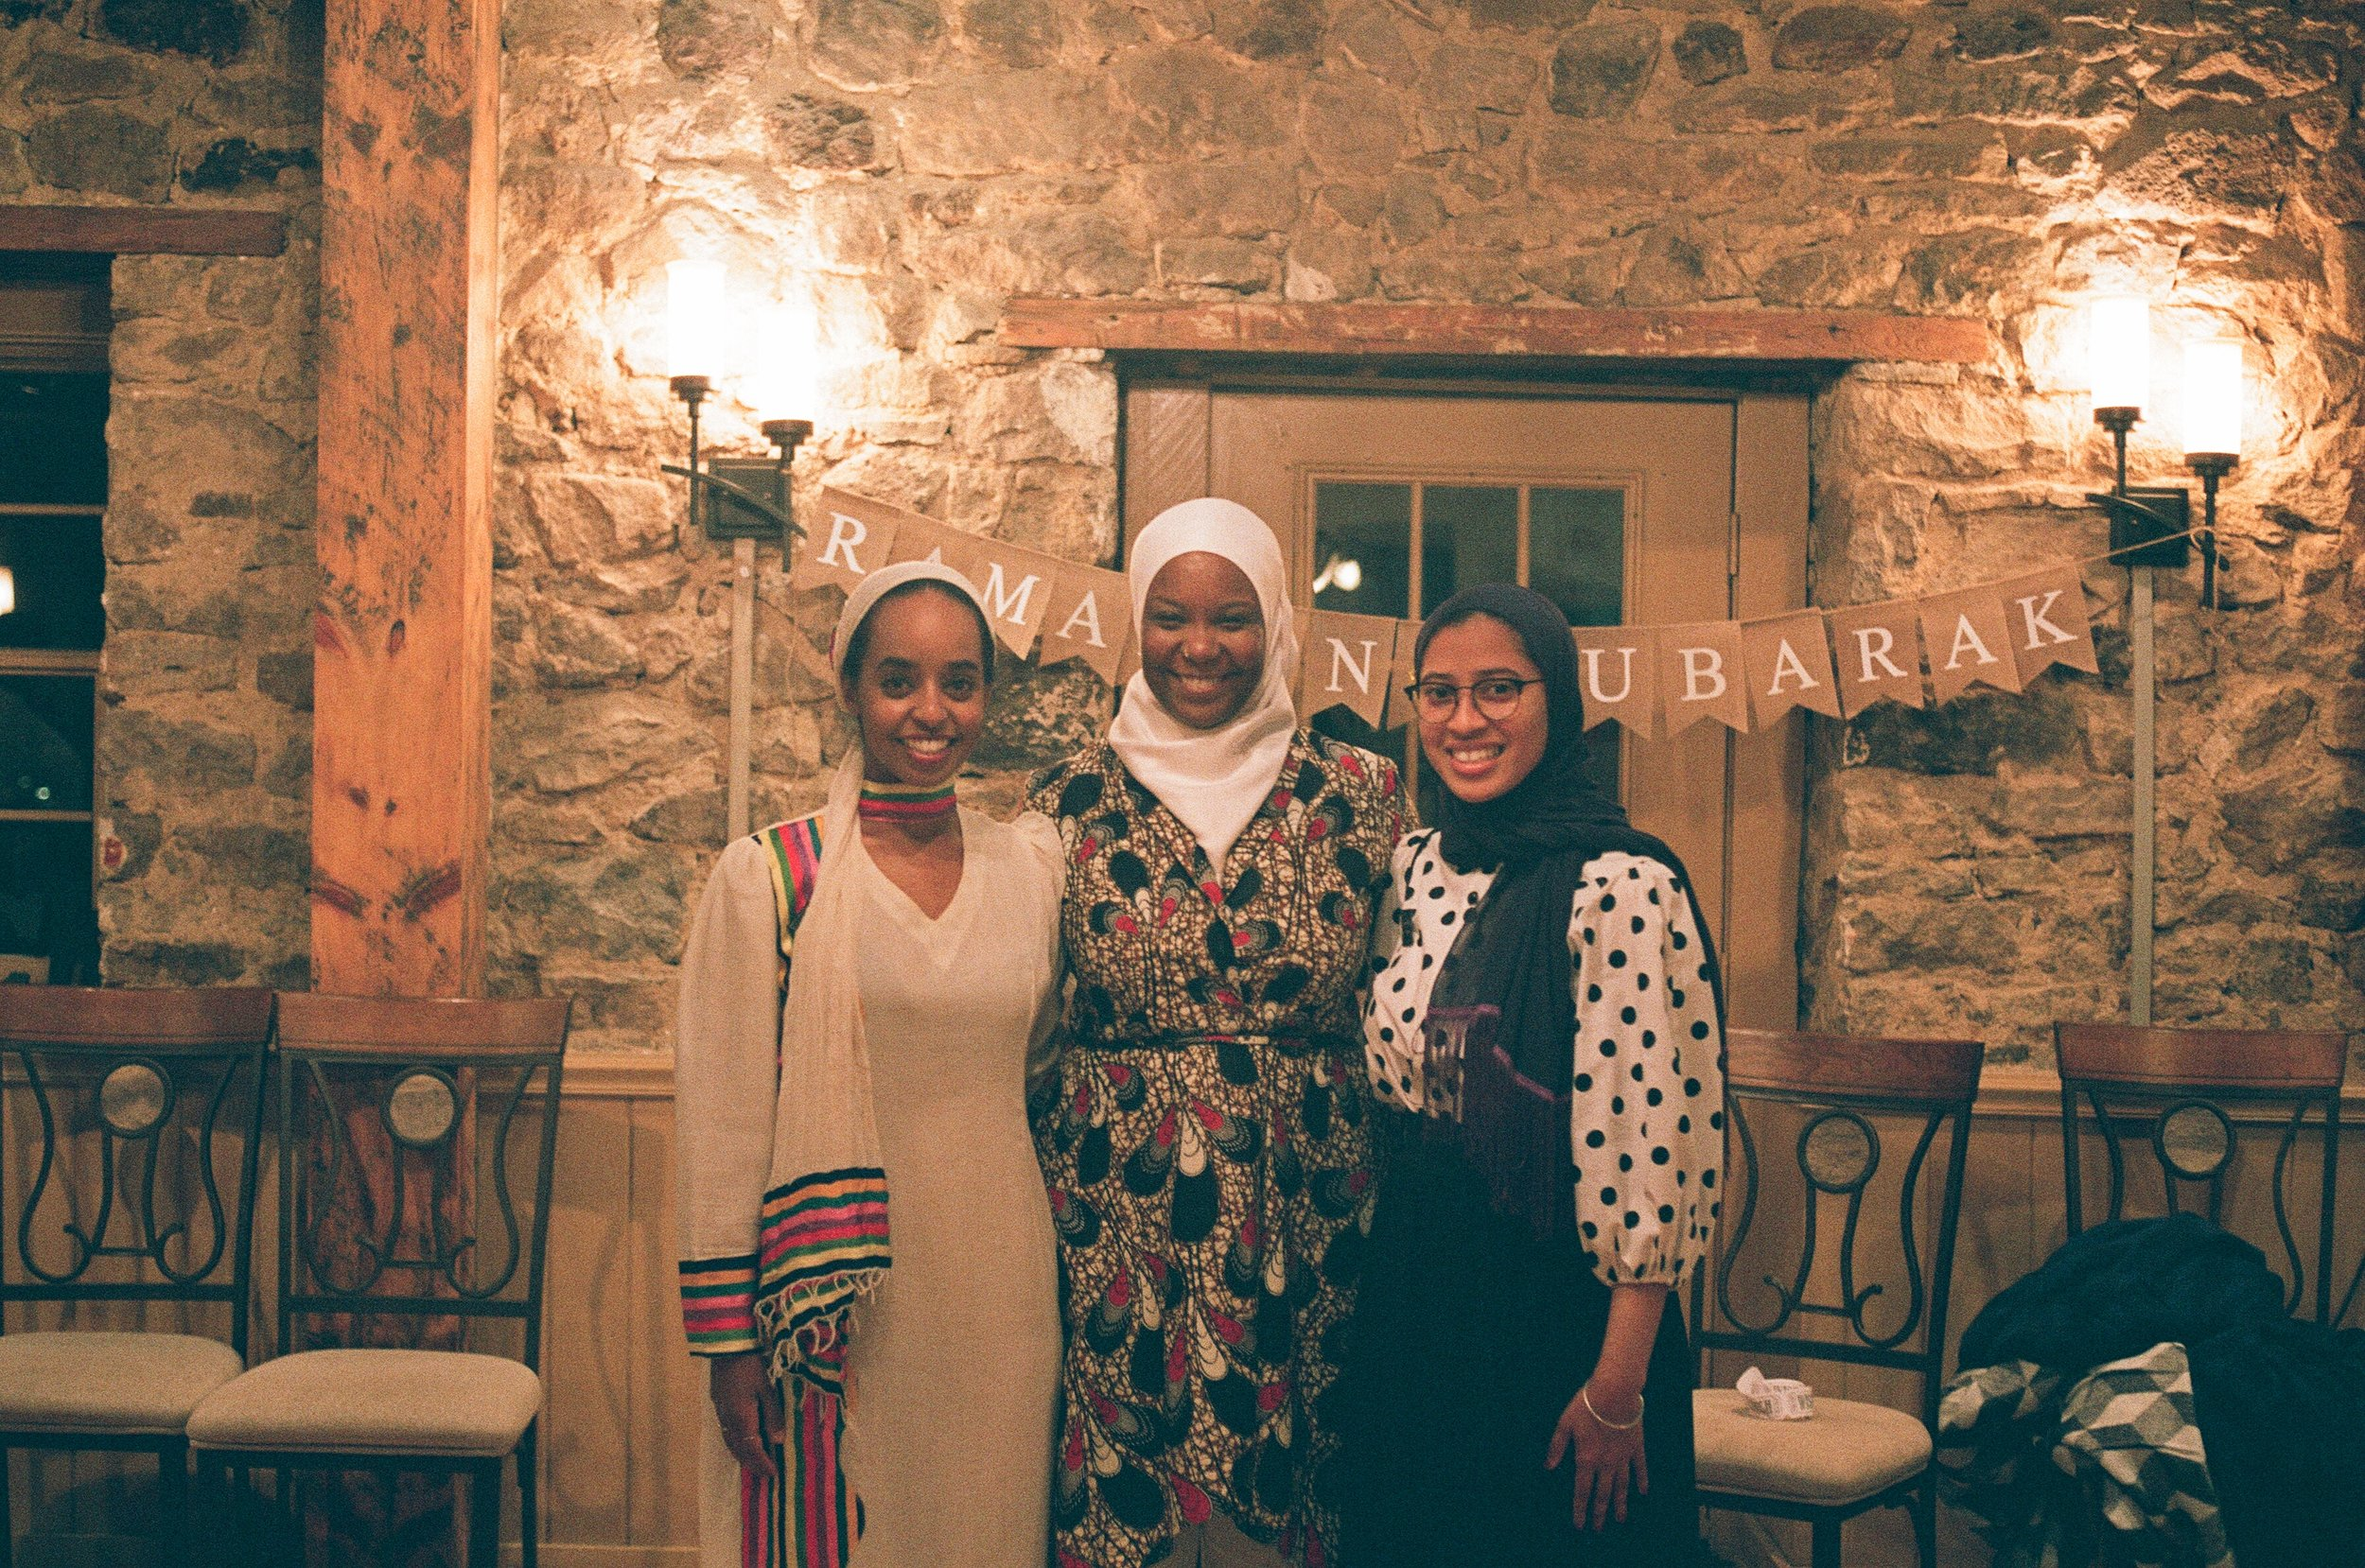 Samira, Kameelah and Leila